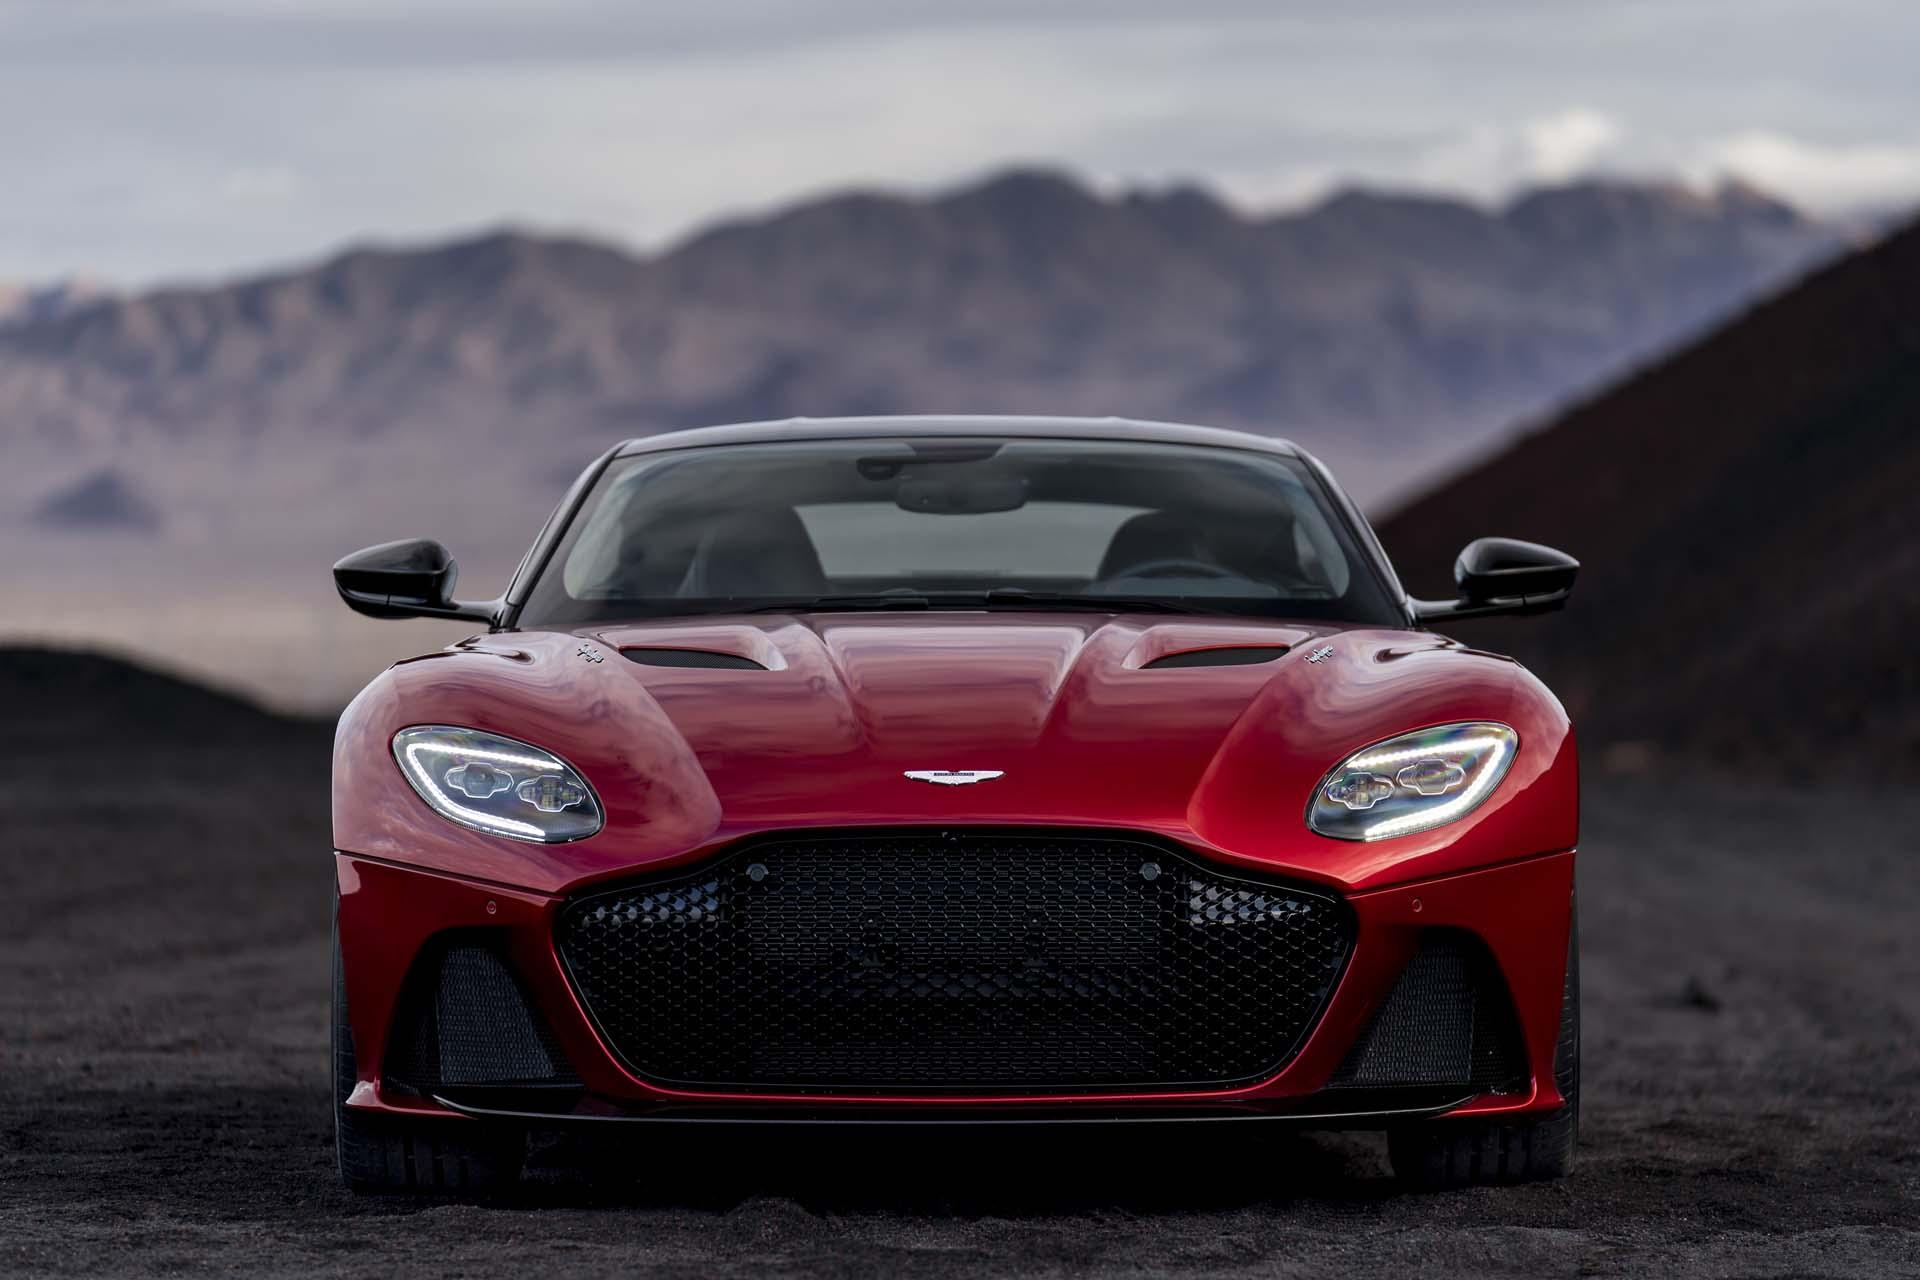 2019 Aston Martin Dbs 2019 Mercedes Benz Cls 2019 Hennessey